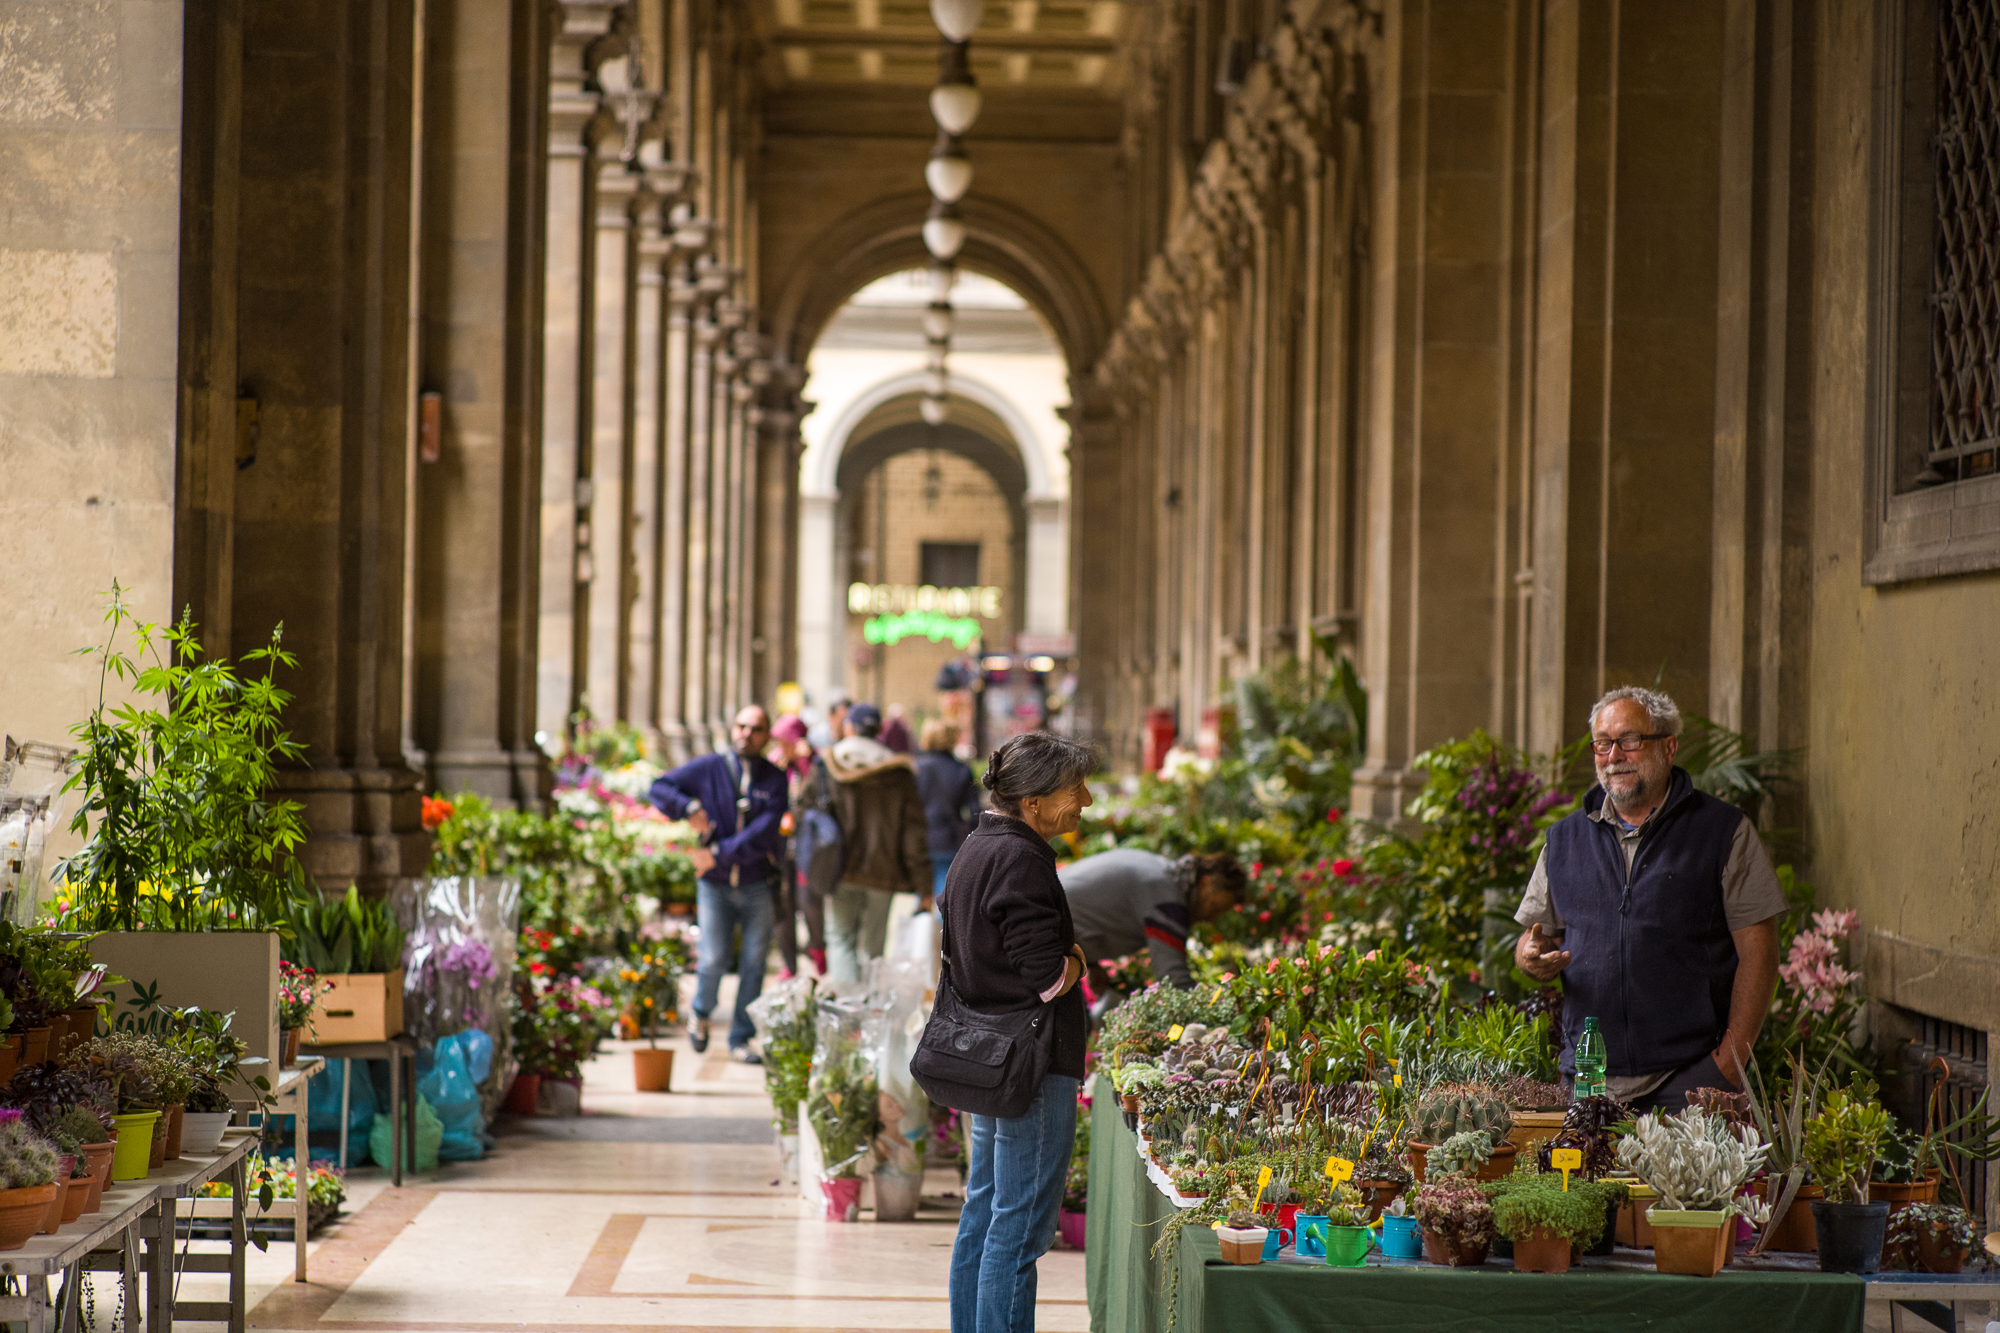 Flower market in Florence